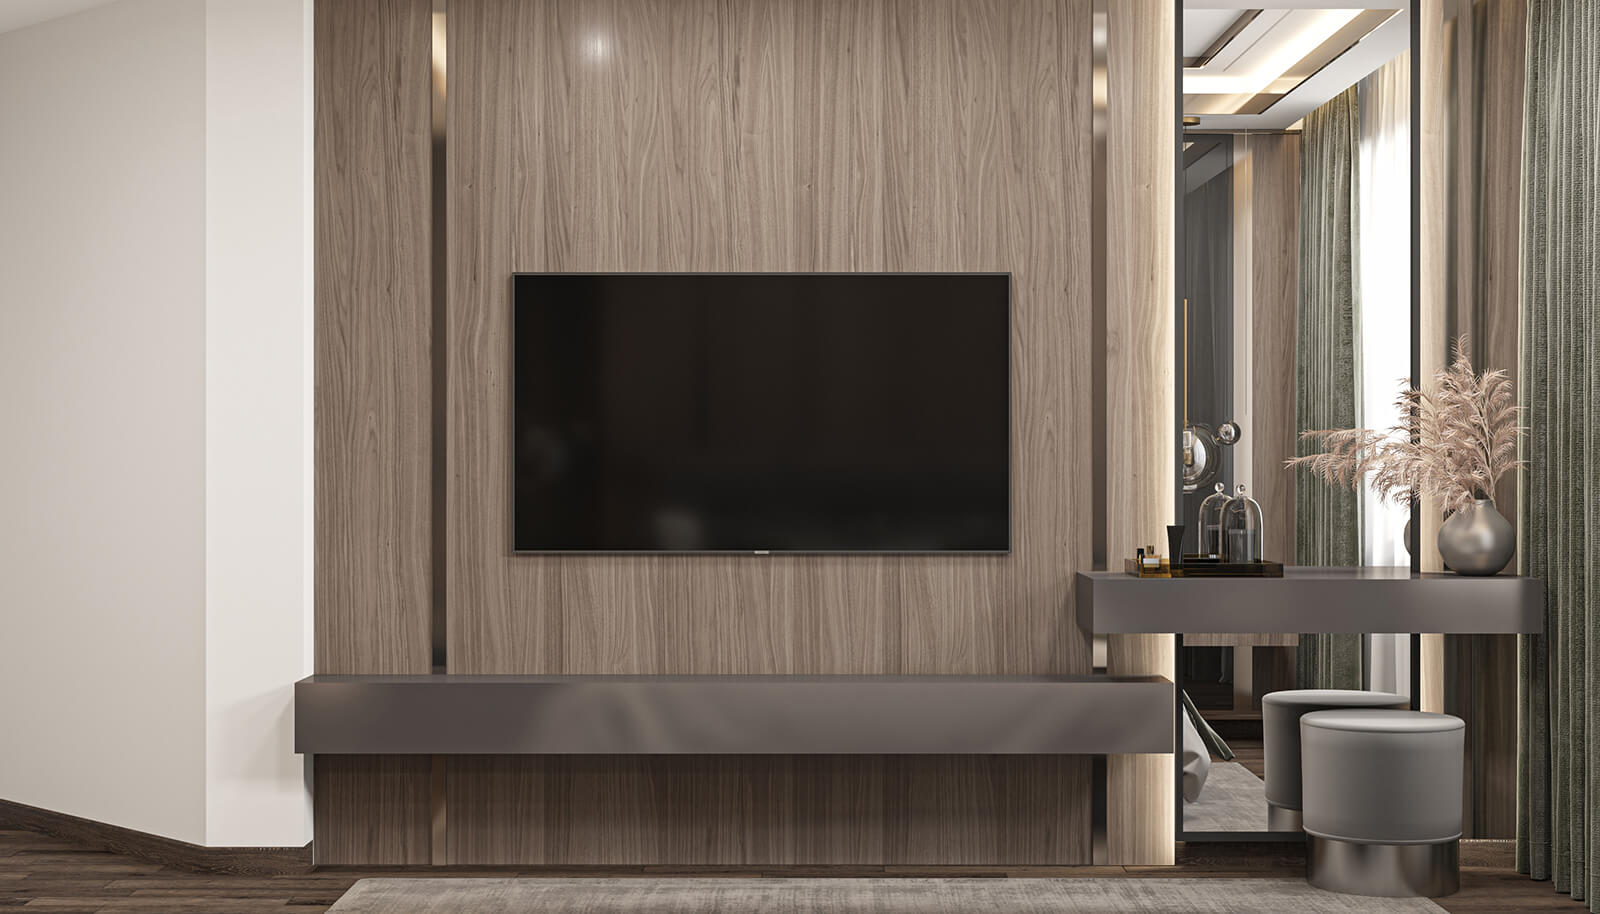 interioren-dizain-proekt-na-spalnya-marquise